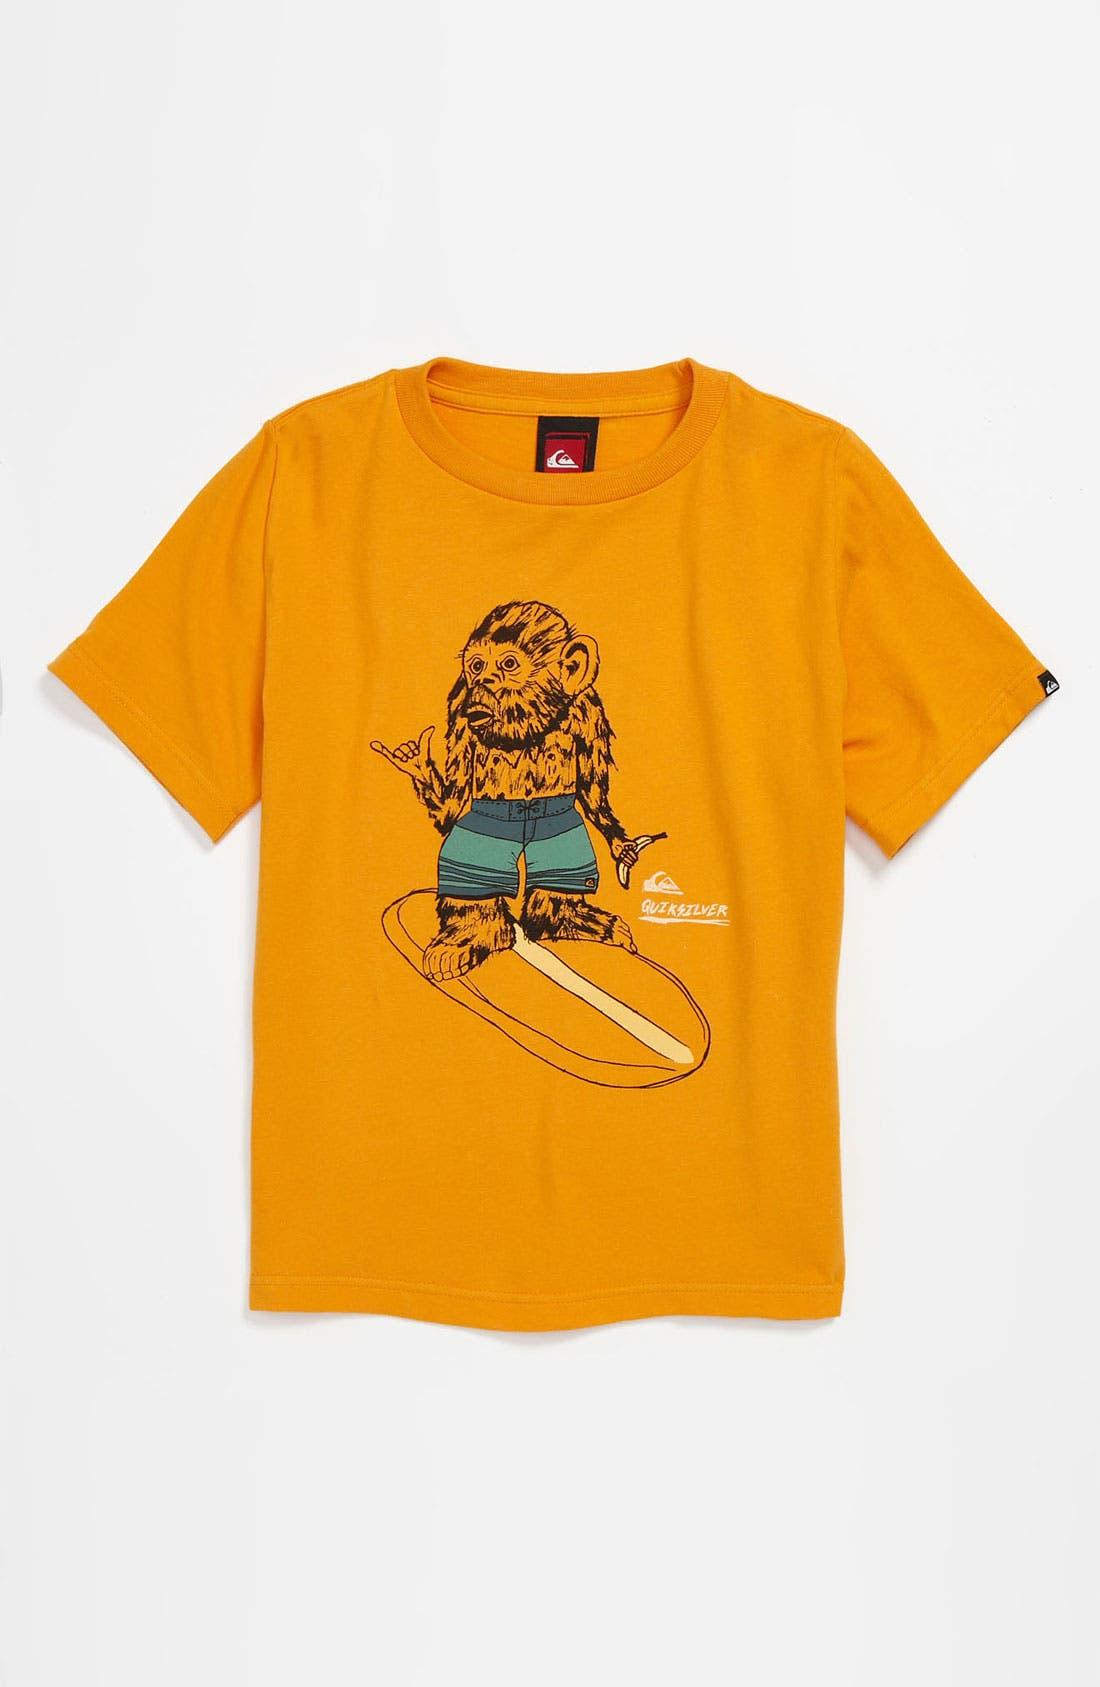 Alternate Image 1 Selected - Quiksilver 'Simple Things' Ring Spun Jersey T-Shirt (Big Boys)